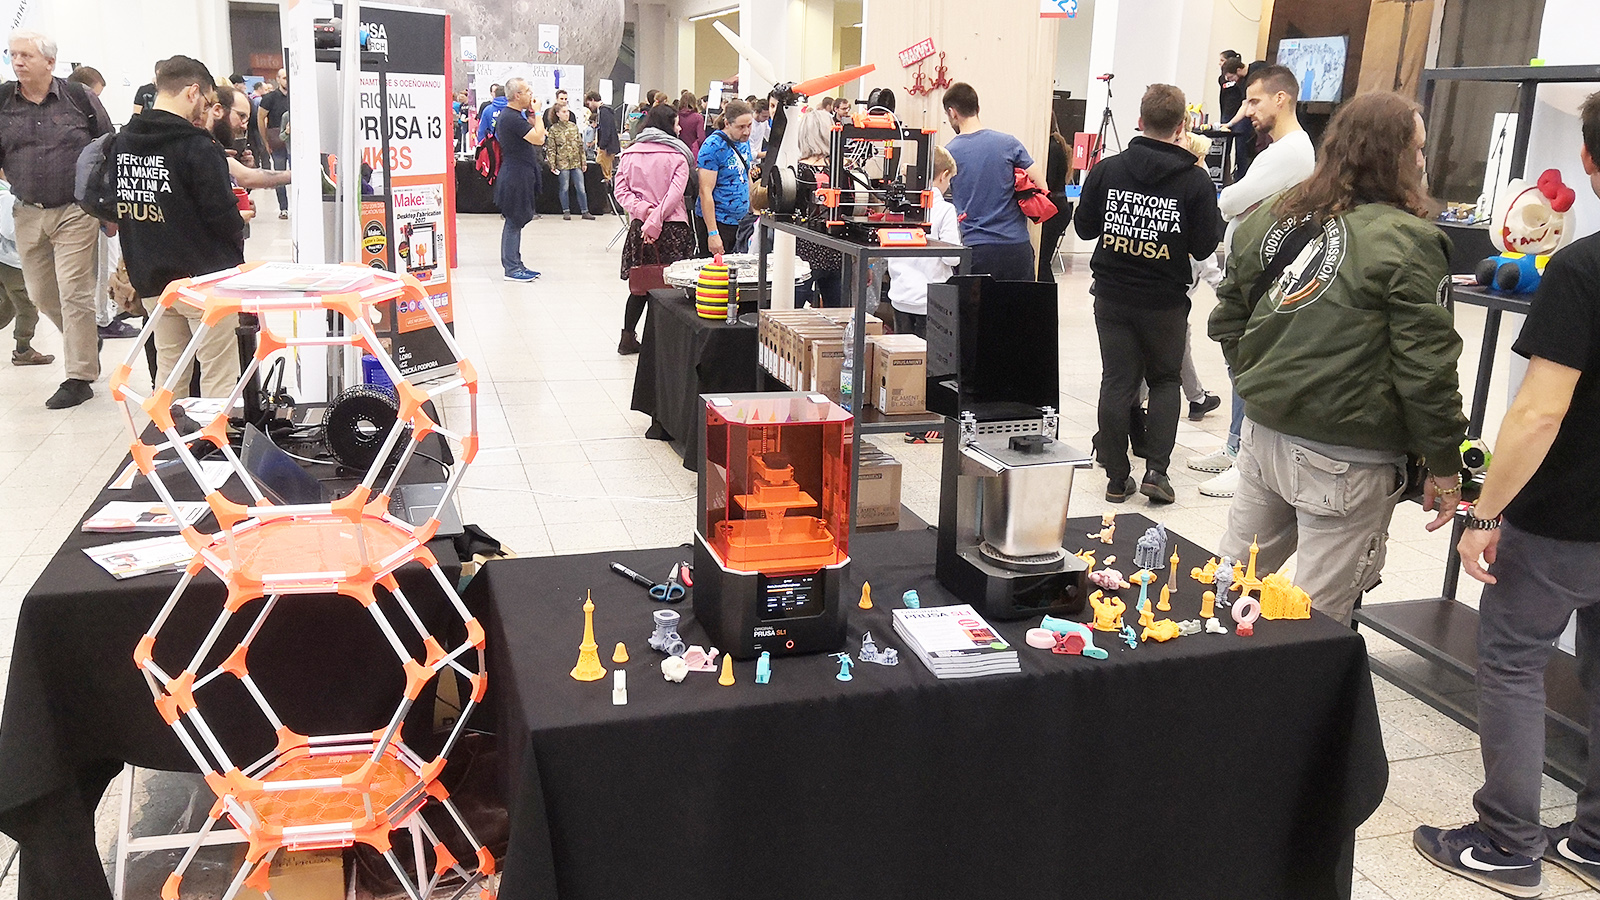 Original Prusa SL1 Prusa Research Mini Maker Faire Brno